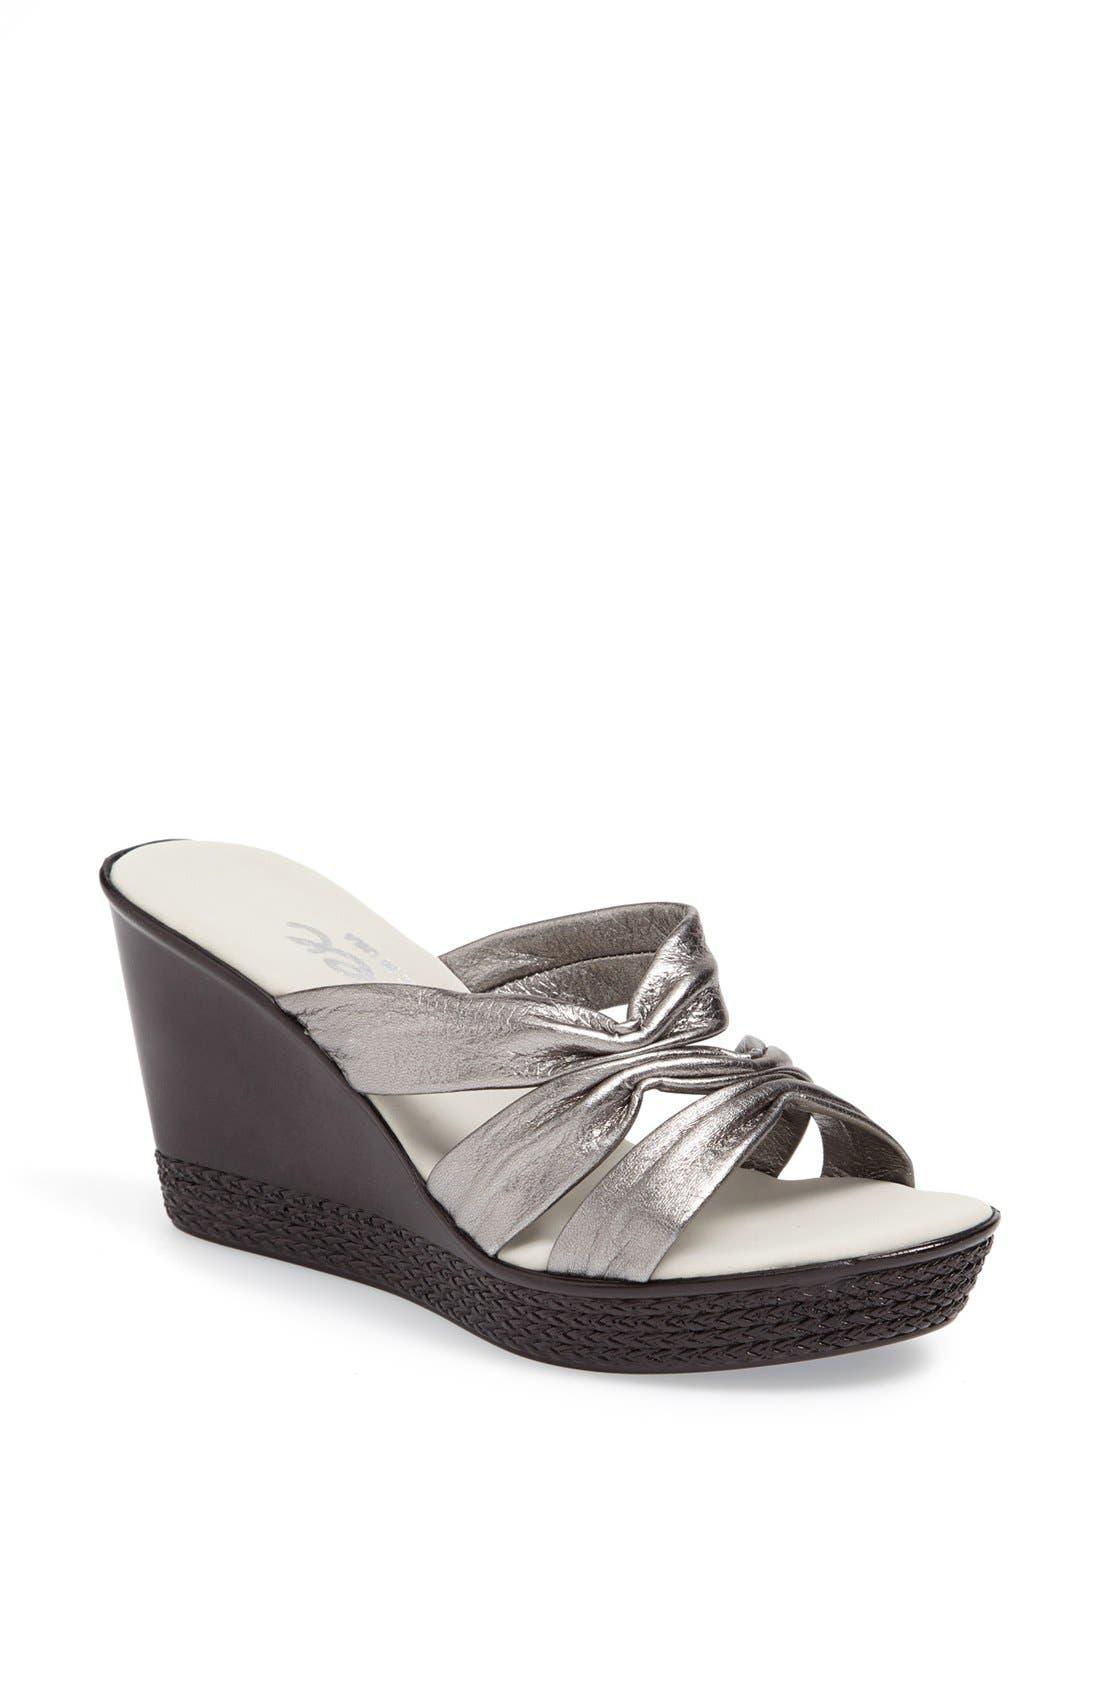 Alternate Image 1 Selected - Onex 'Felicity' Wedge Sandal